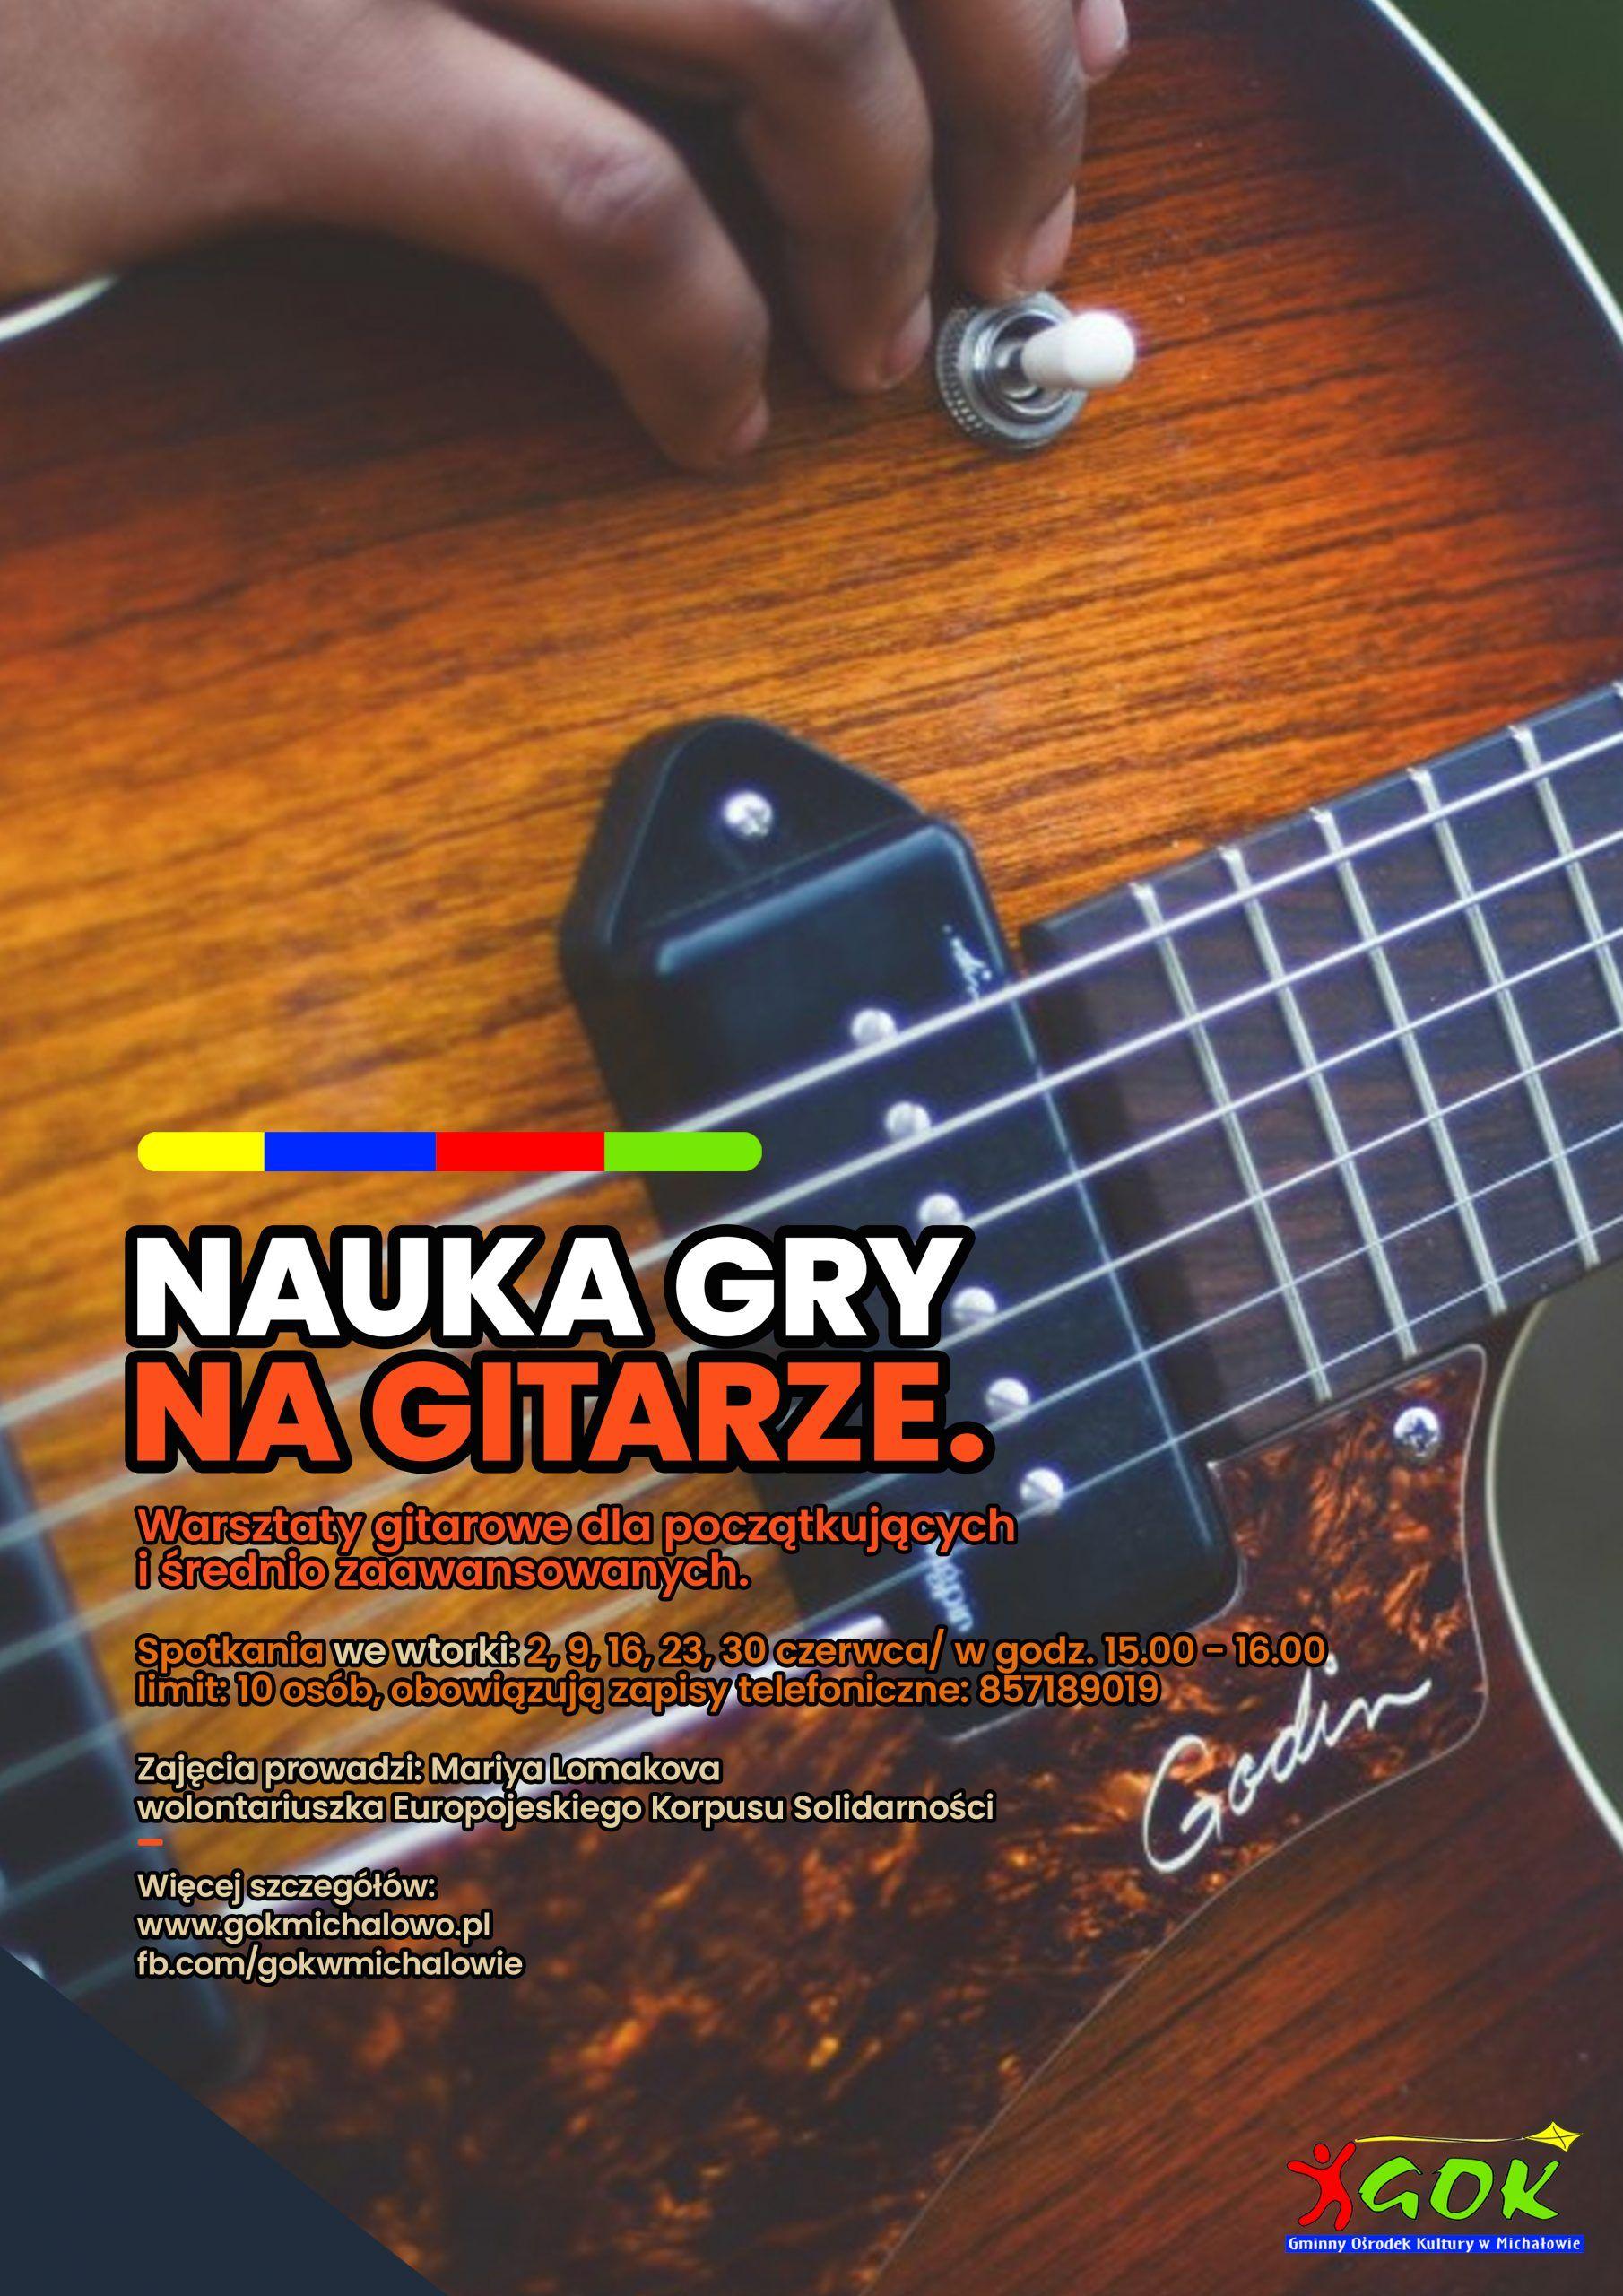 nauka gry na gitarze plakat